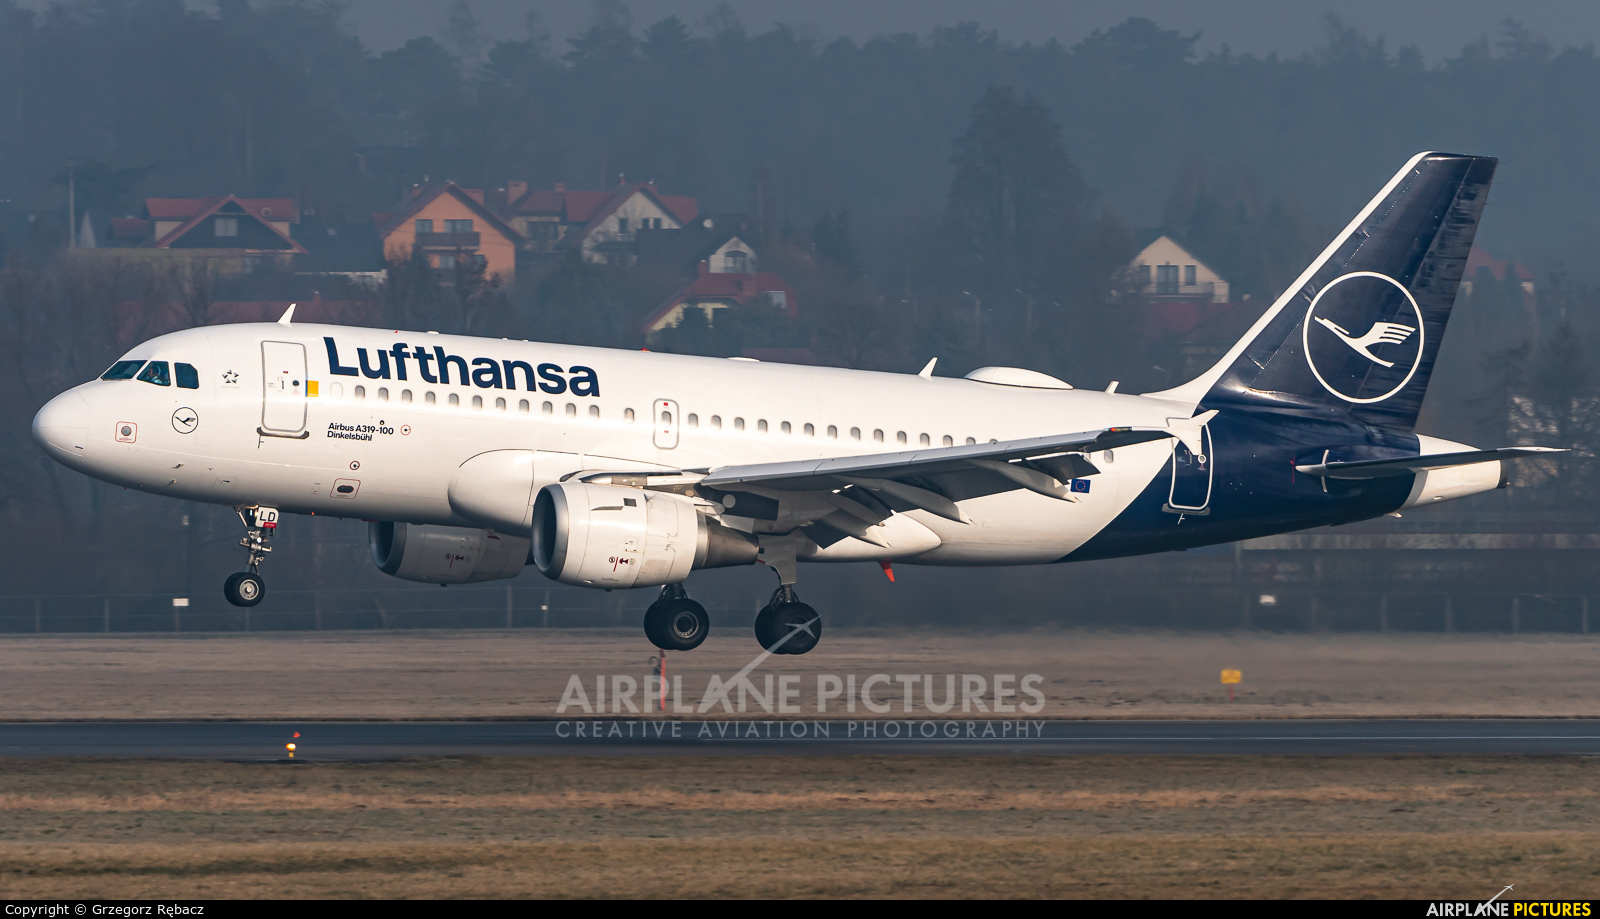 Lufthansa D-AILD aircraft at Kraków - John Paul II Intl